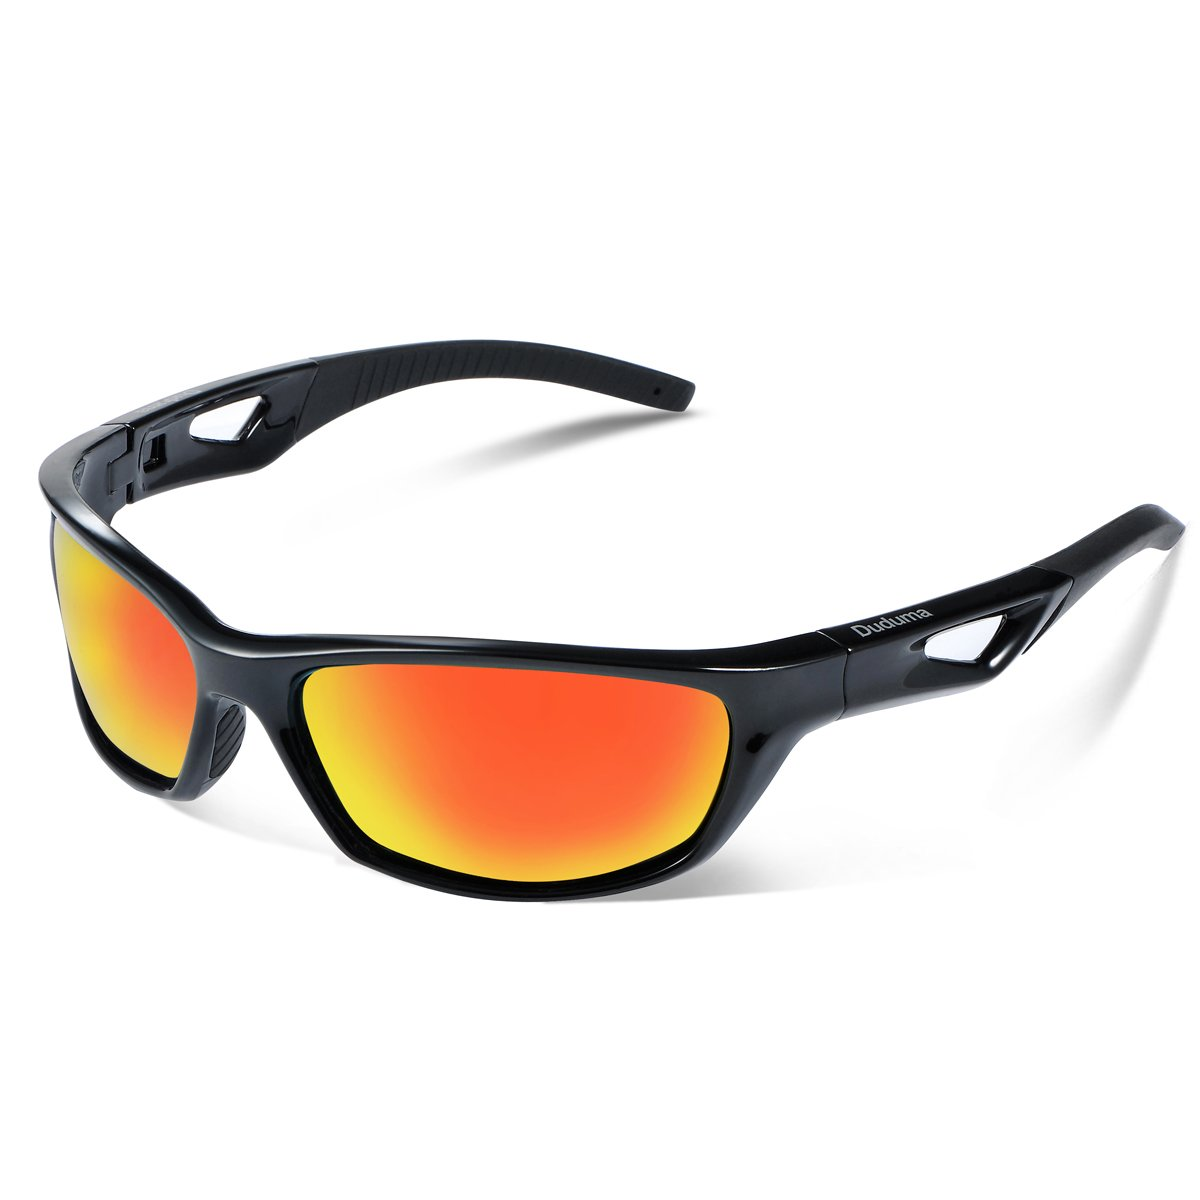 dcbd13cf974e2 Duduma Polarized Sport Mens Sunglasses for Baseball Fishing Golf Running  Cycling with Fashion Women Sunglasses and Men Sunglasses Tr80821 Flexible  ...